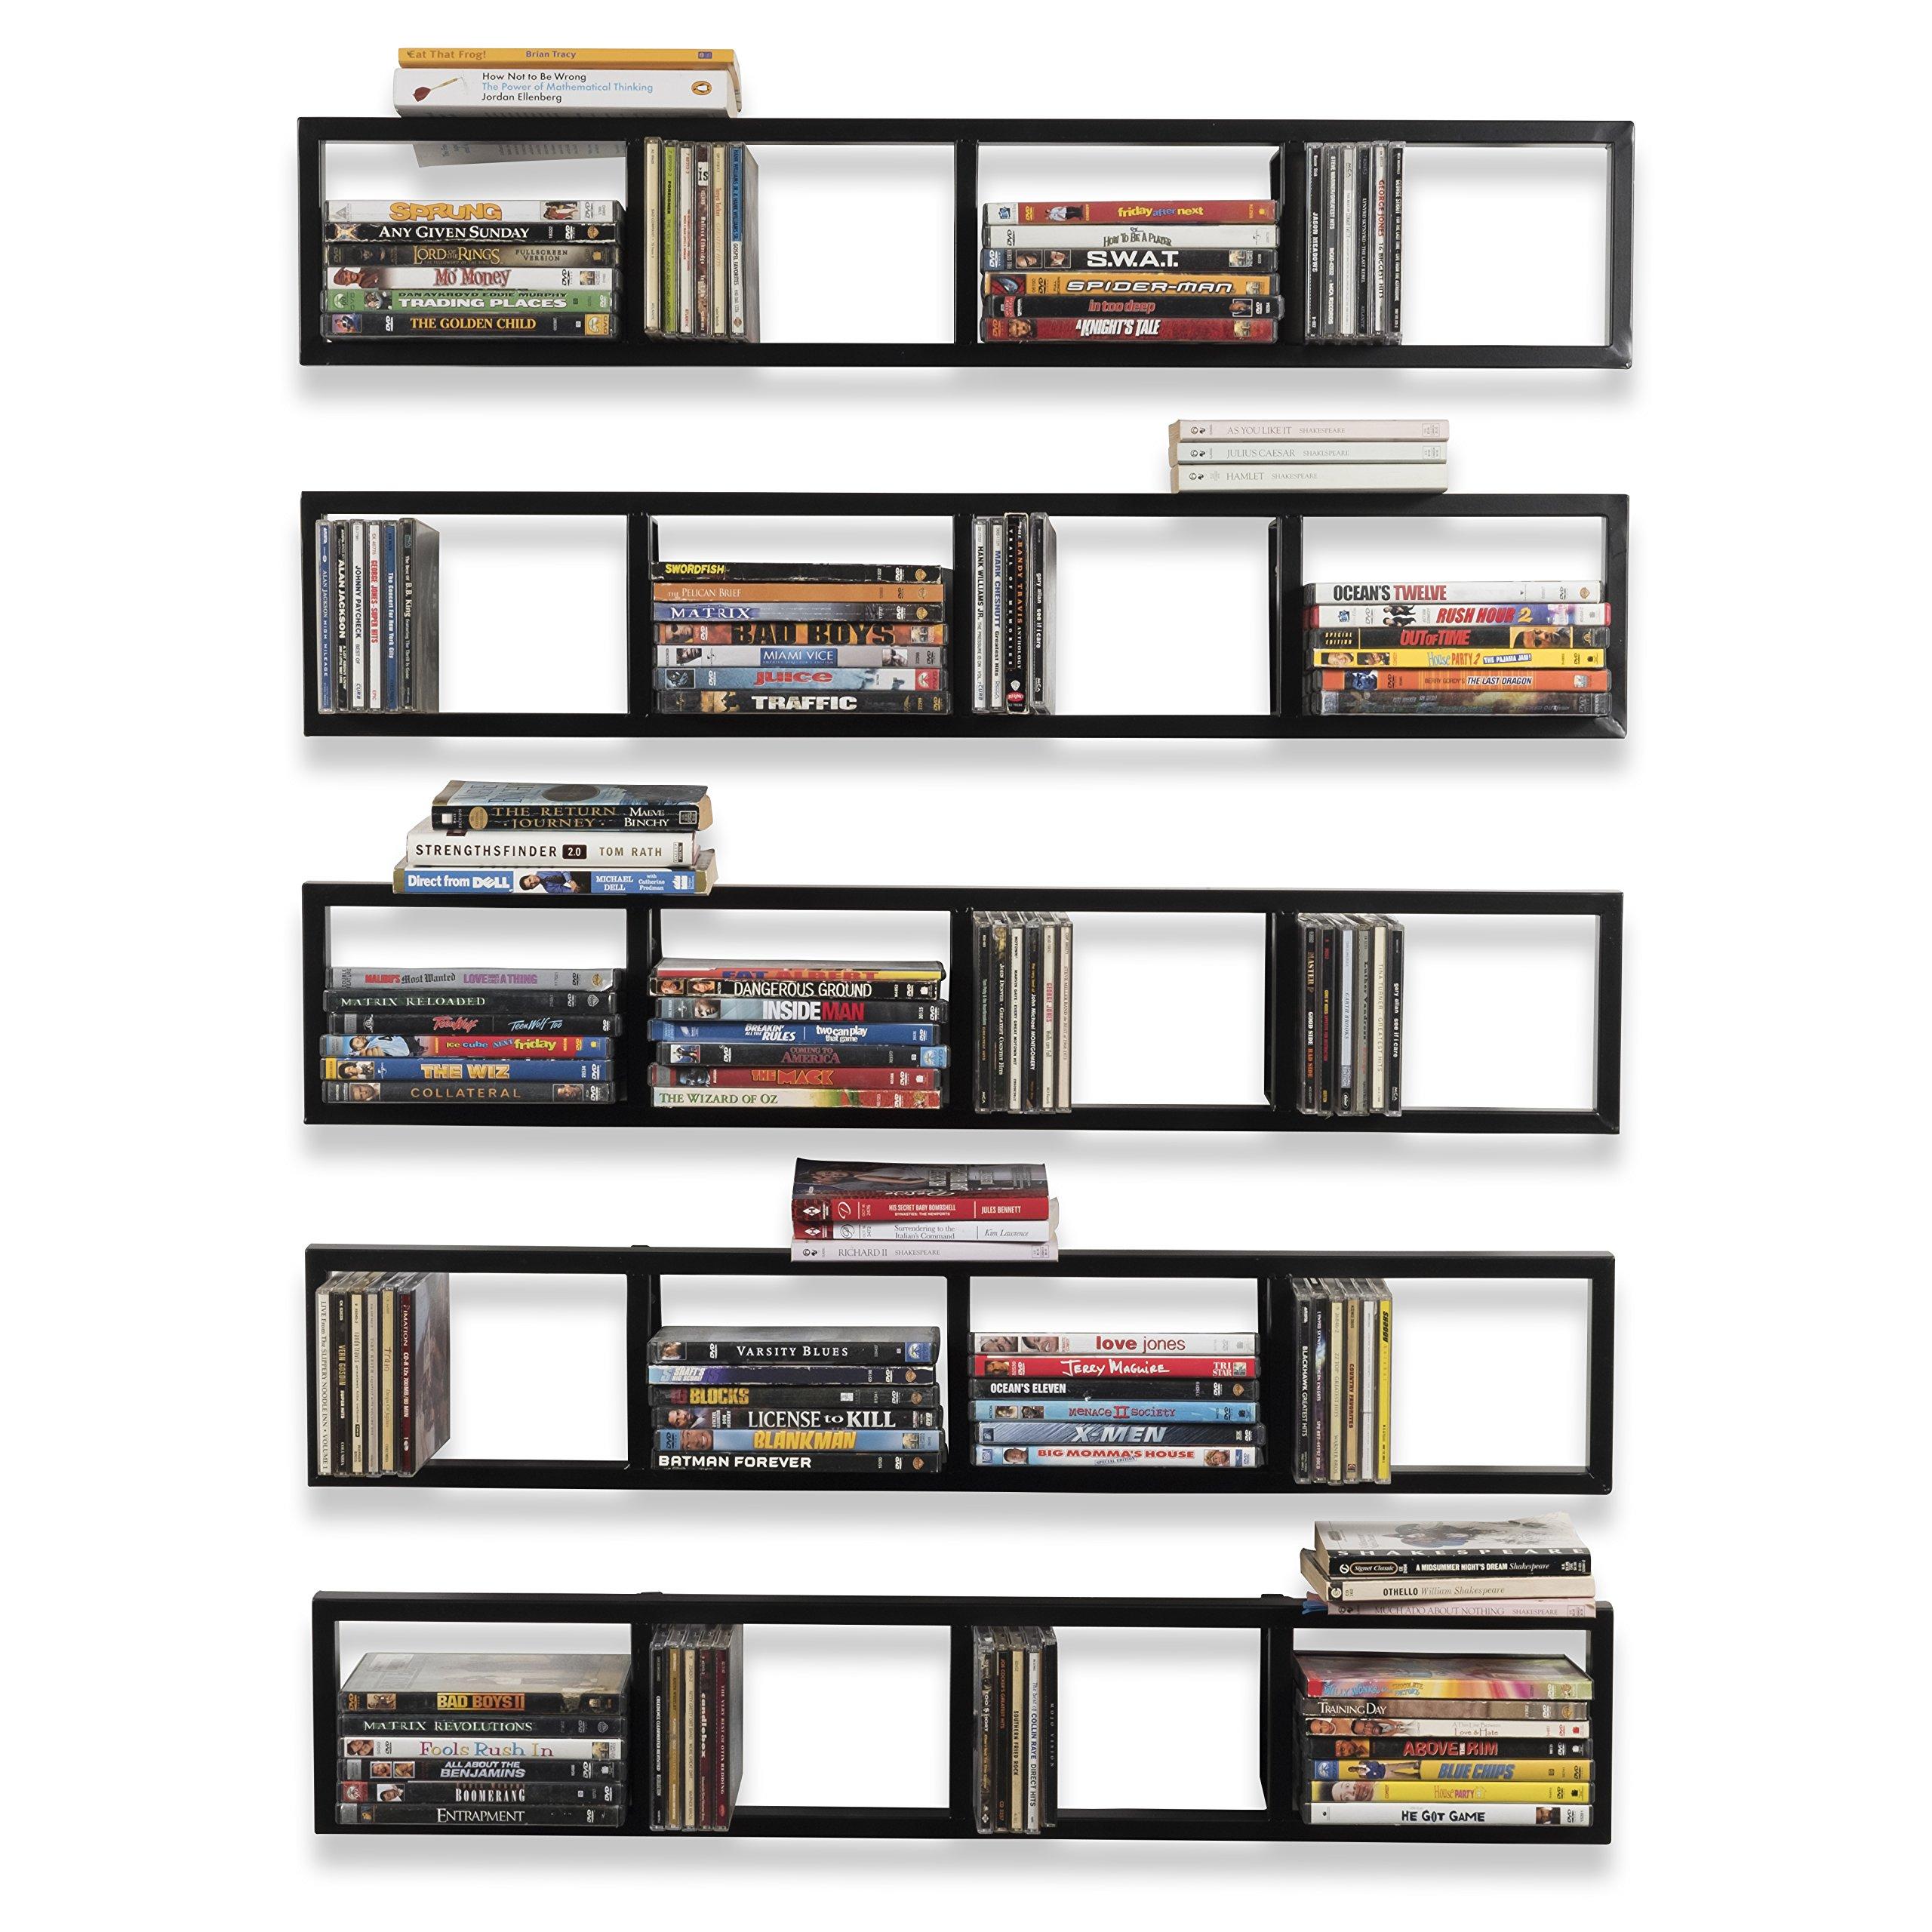 Wall Mount 34 Inch Media Storage Rack CD DVD Organizer Metal Floating Shelf Set of 5 Black by BHG